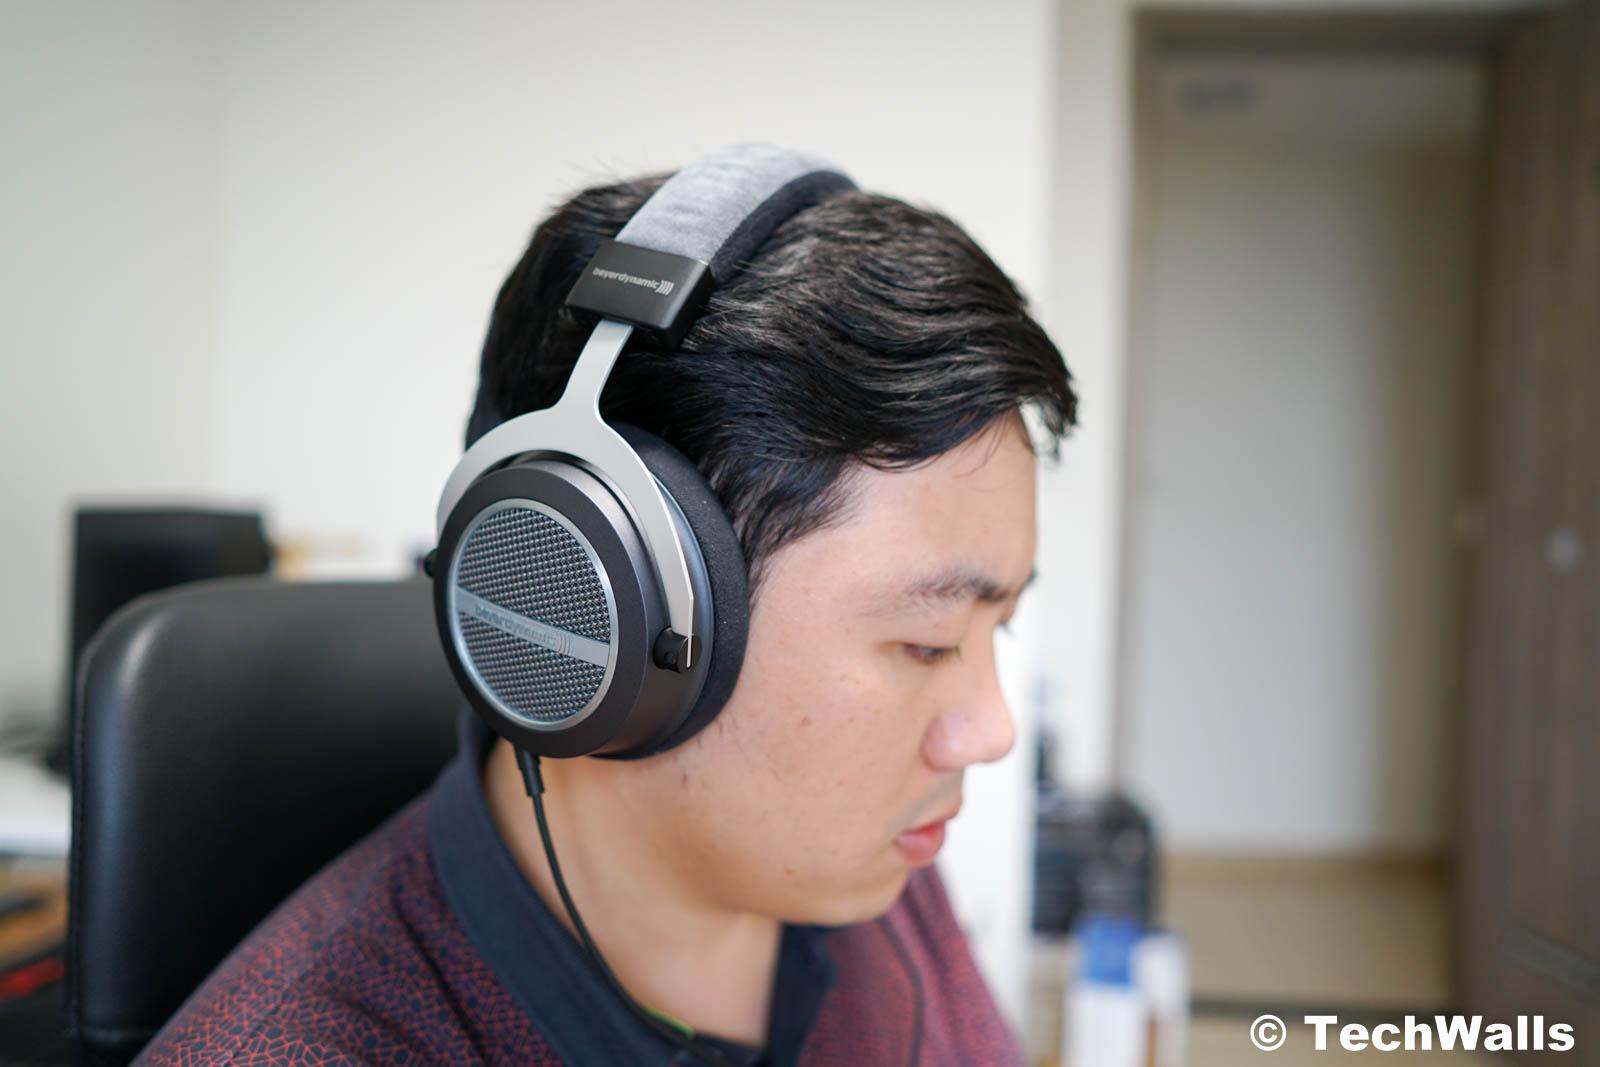 Beyerdynamic Amiron Home Headphones Review - Affordable Audiophile